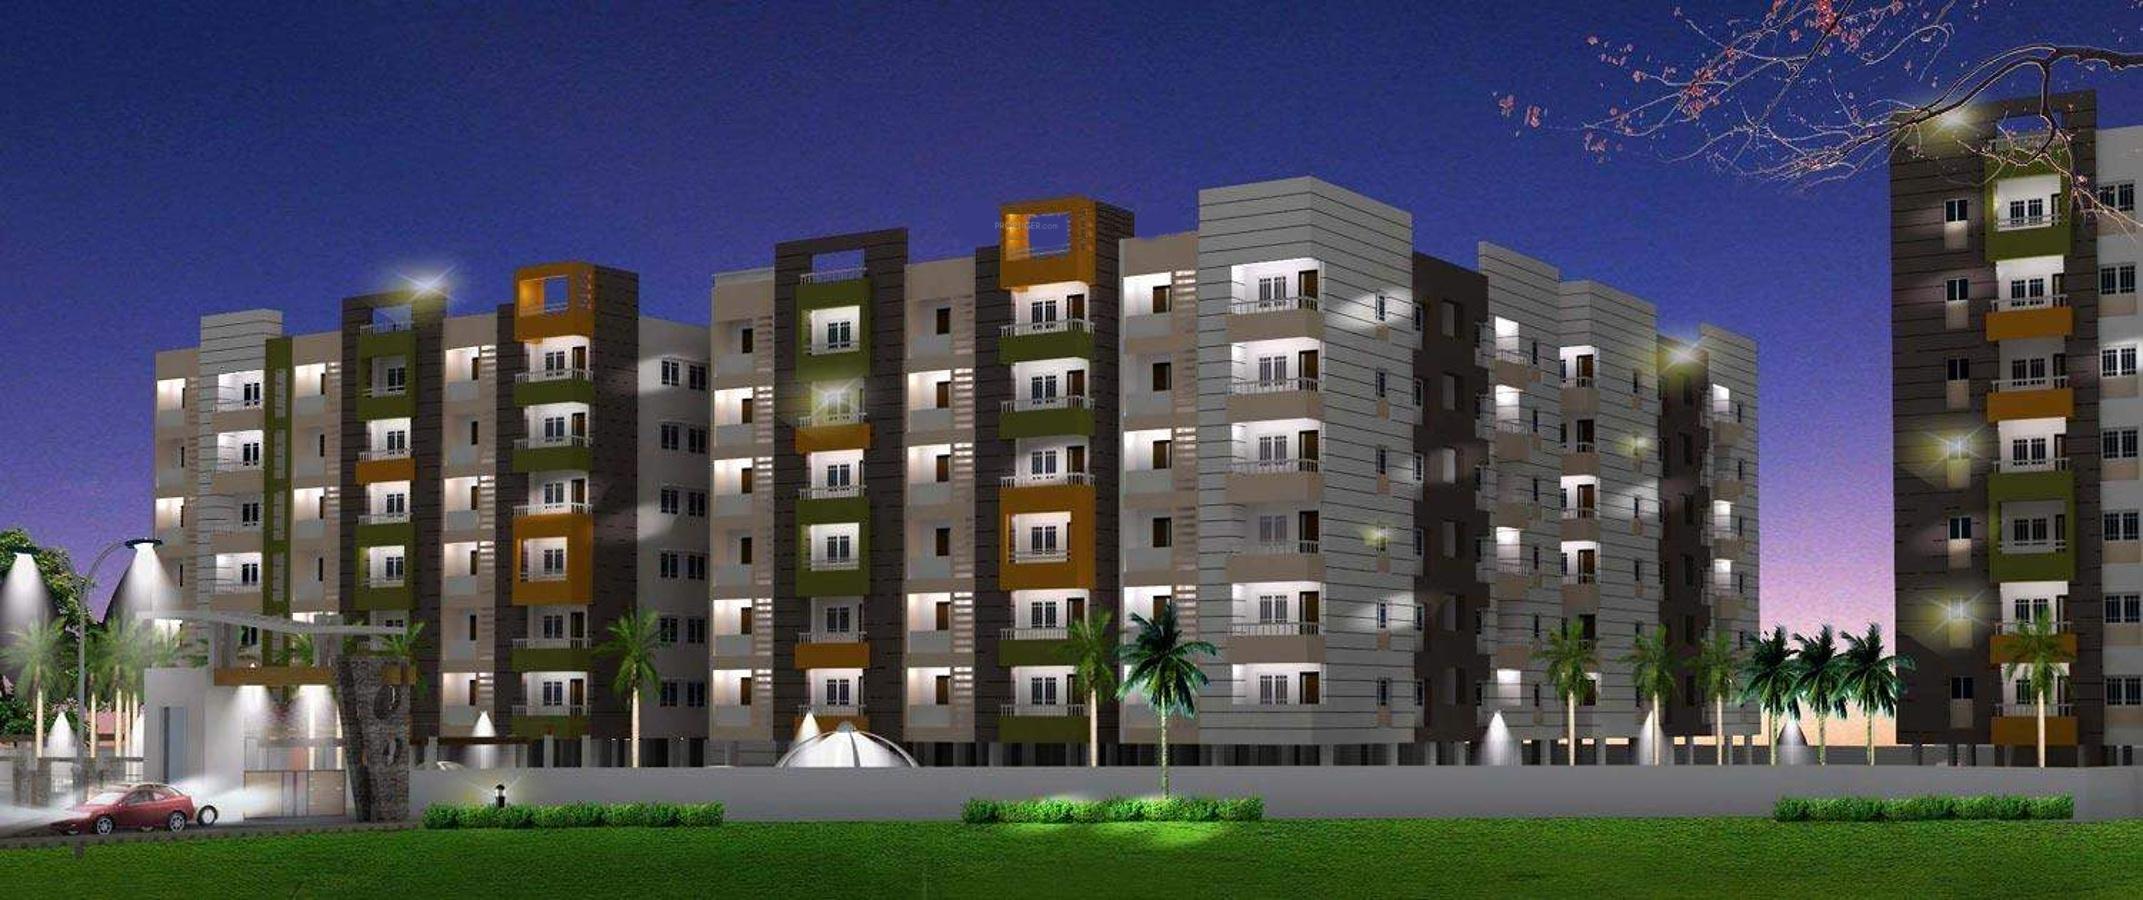 1360 sq ft 3 bhk 3t apartment for sale in hi tech promoters hi tech plaza annex khordha bhubaneswar. Black Bedroom Furniture Sets. Home Design Ideas